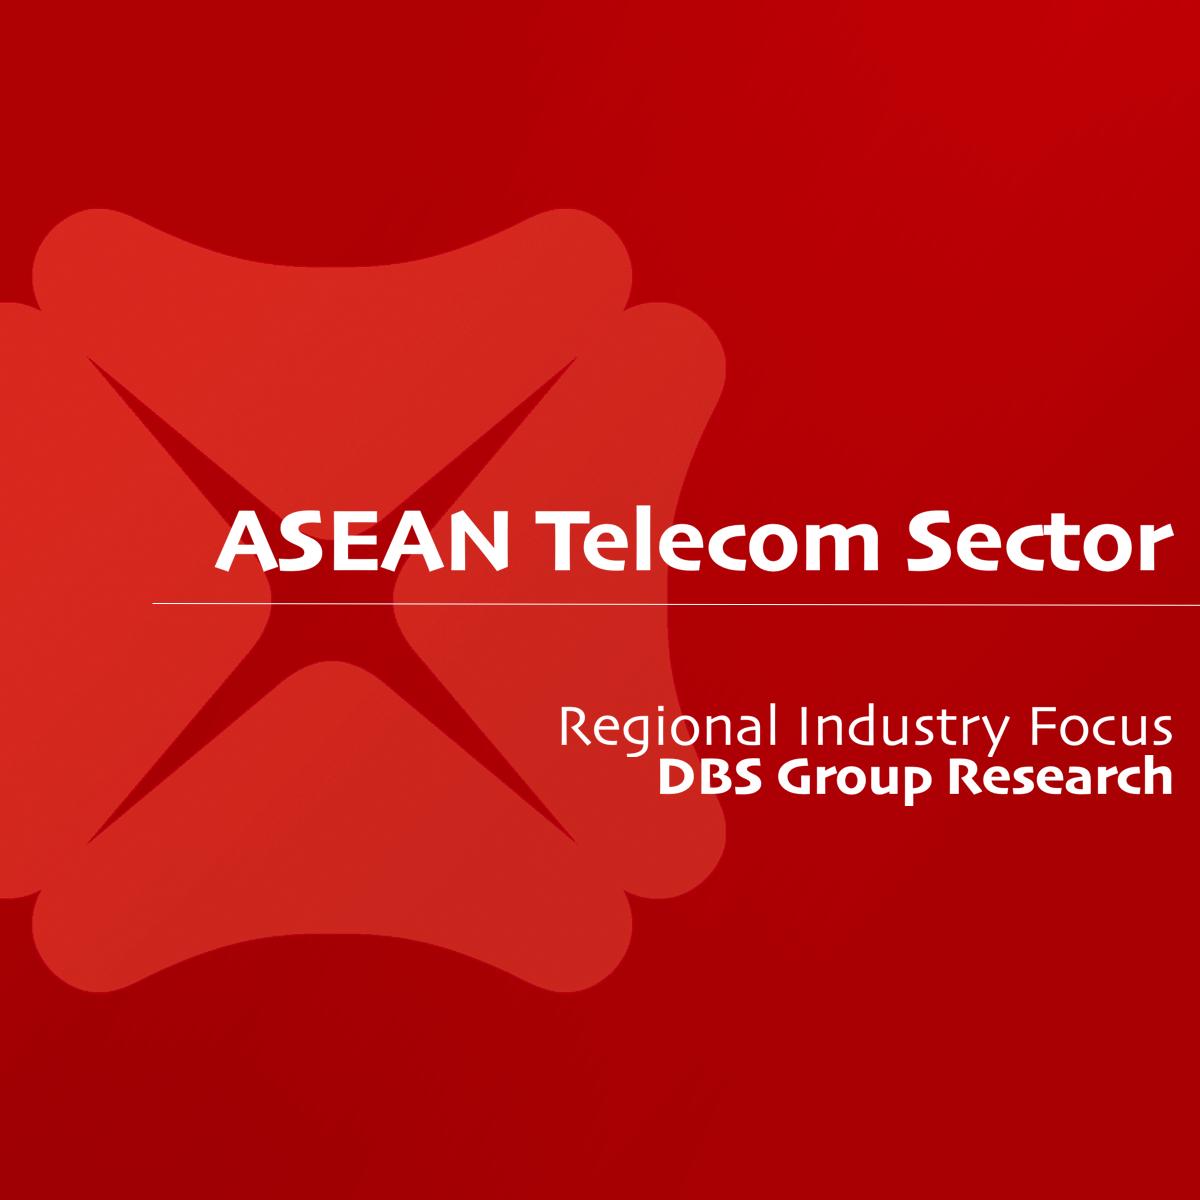 ASEAN Telecom Sector - DBS Group Research | SGinvestors.io